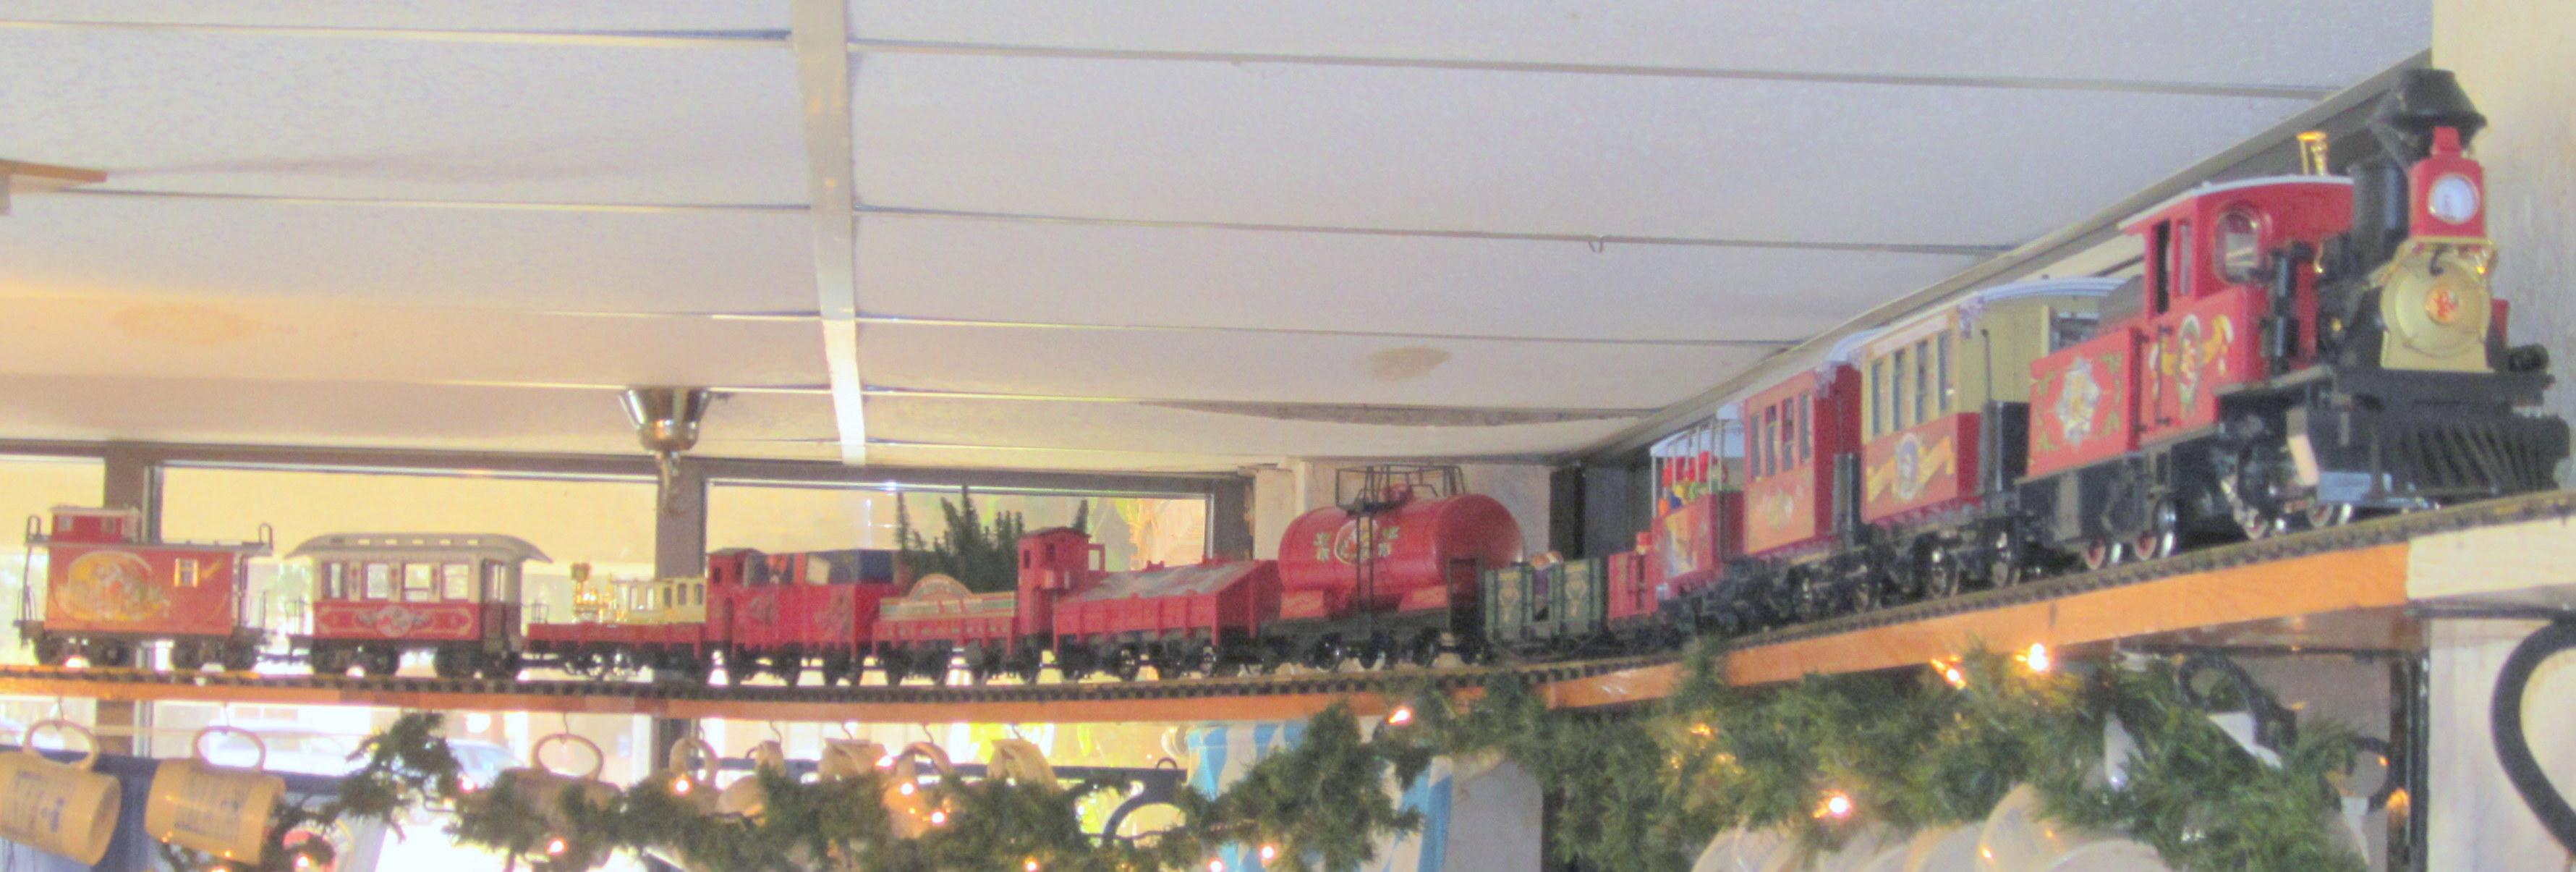 Christmas train Biergarten